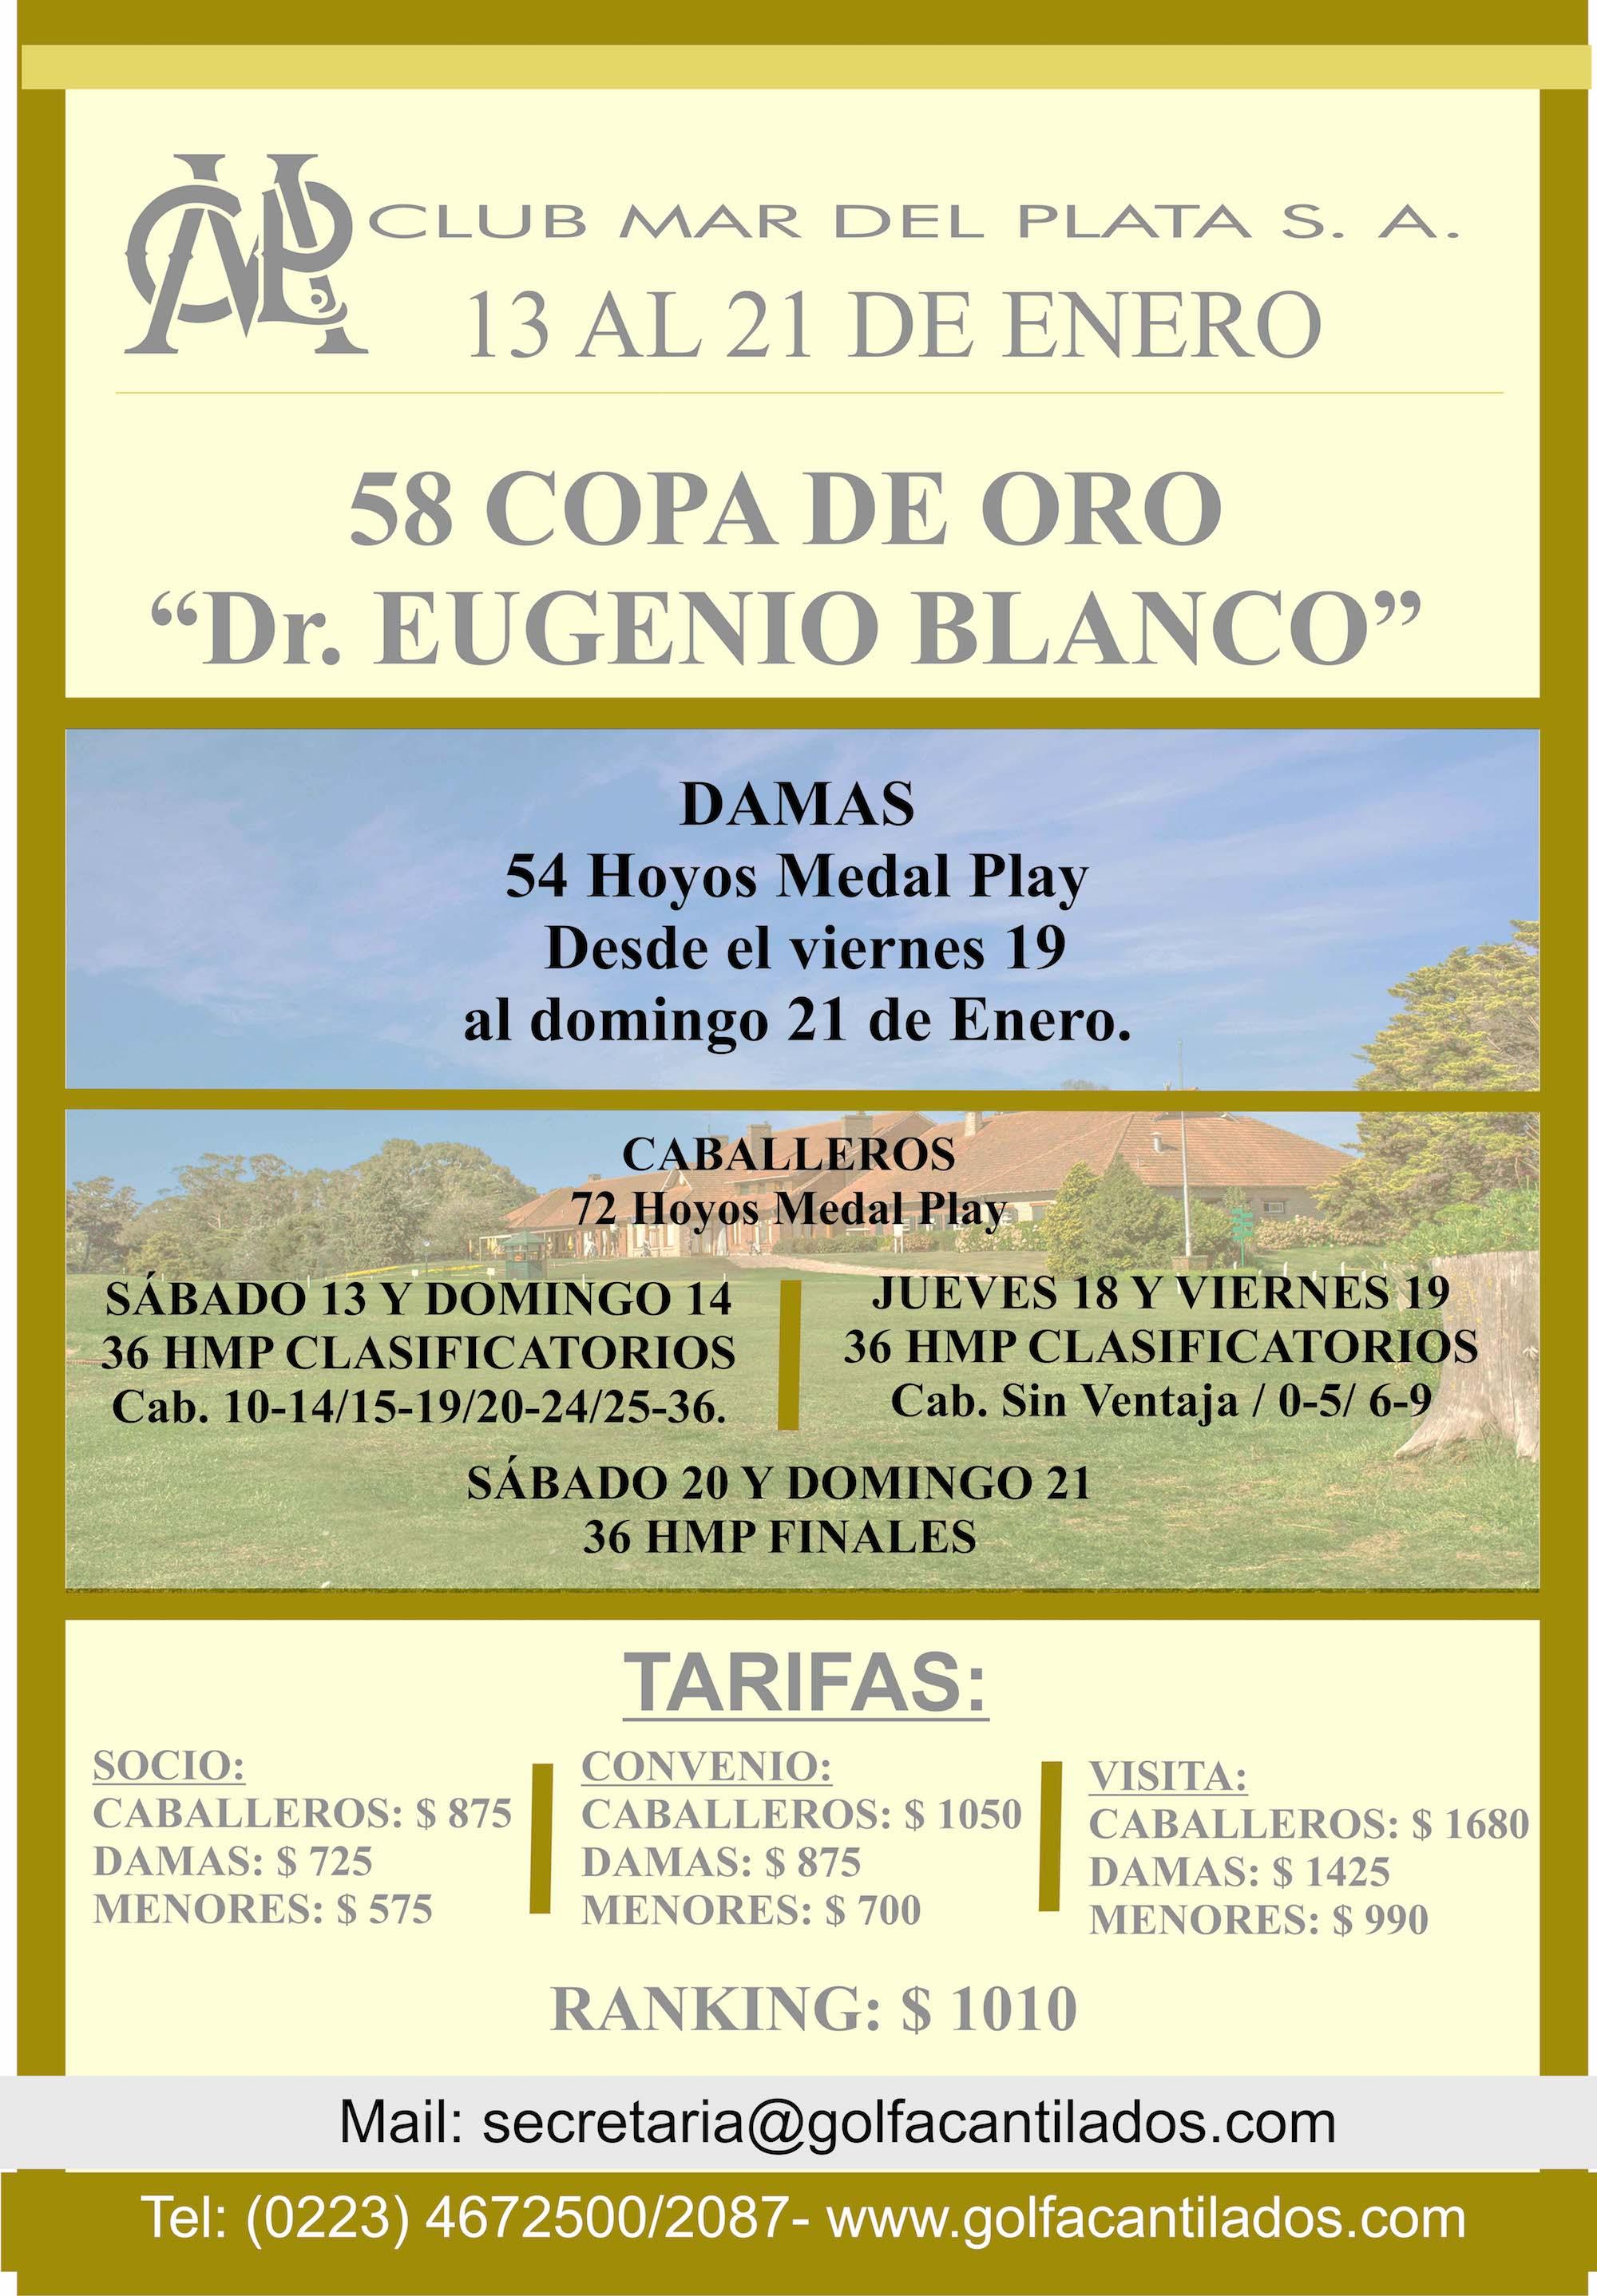 COPA DE ORO EUGENIO BLANCO